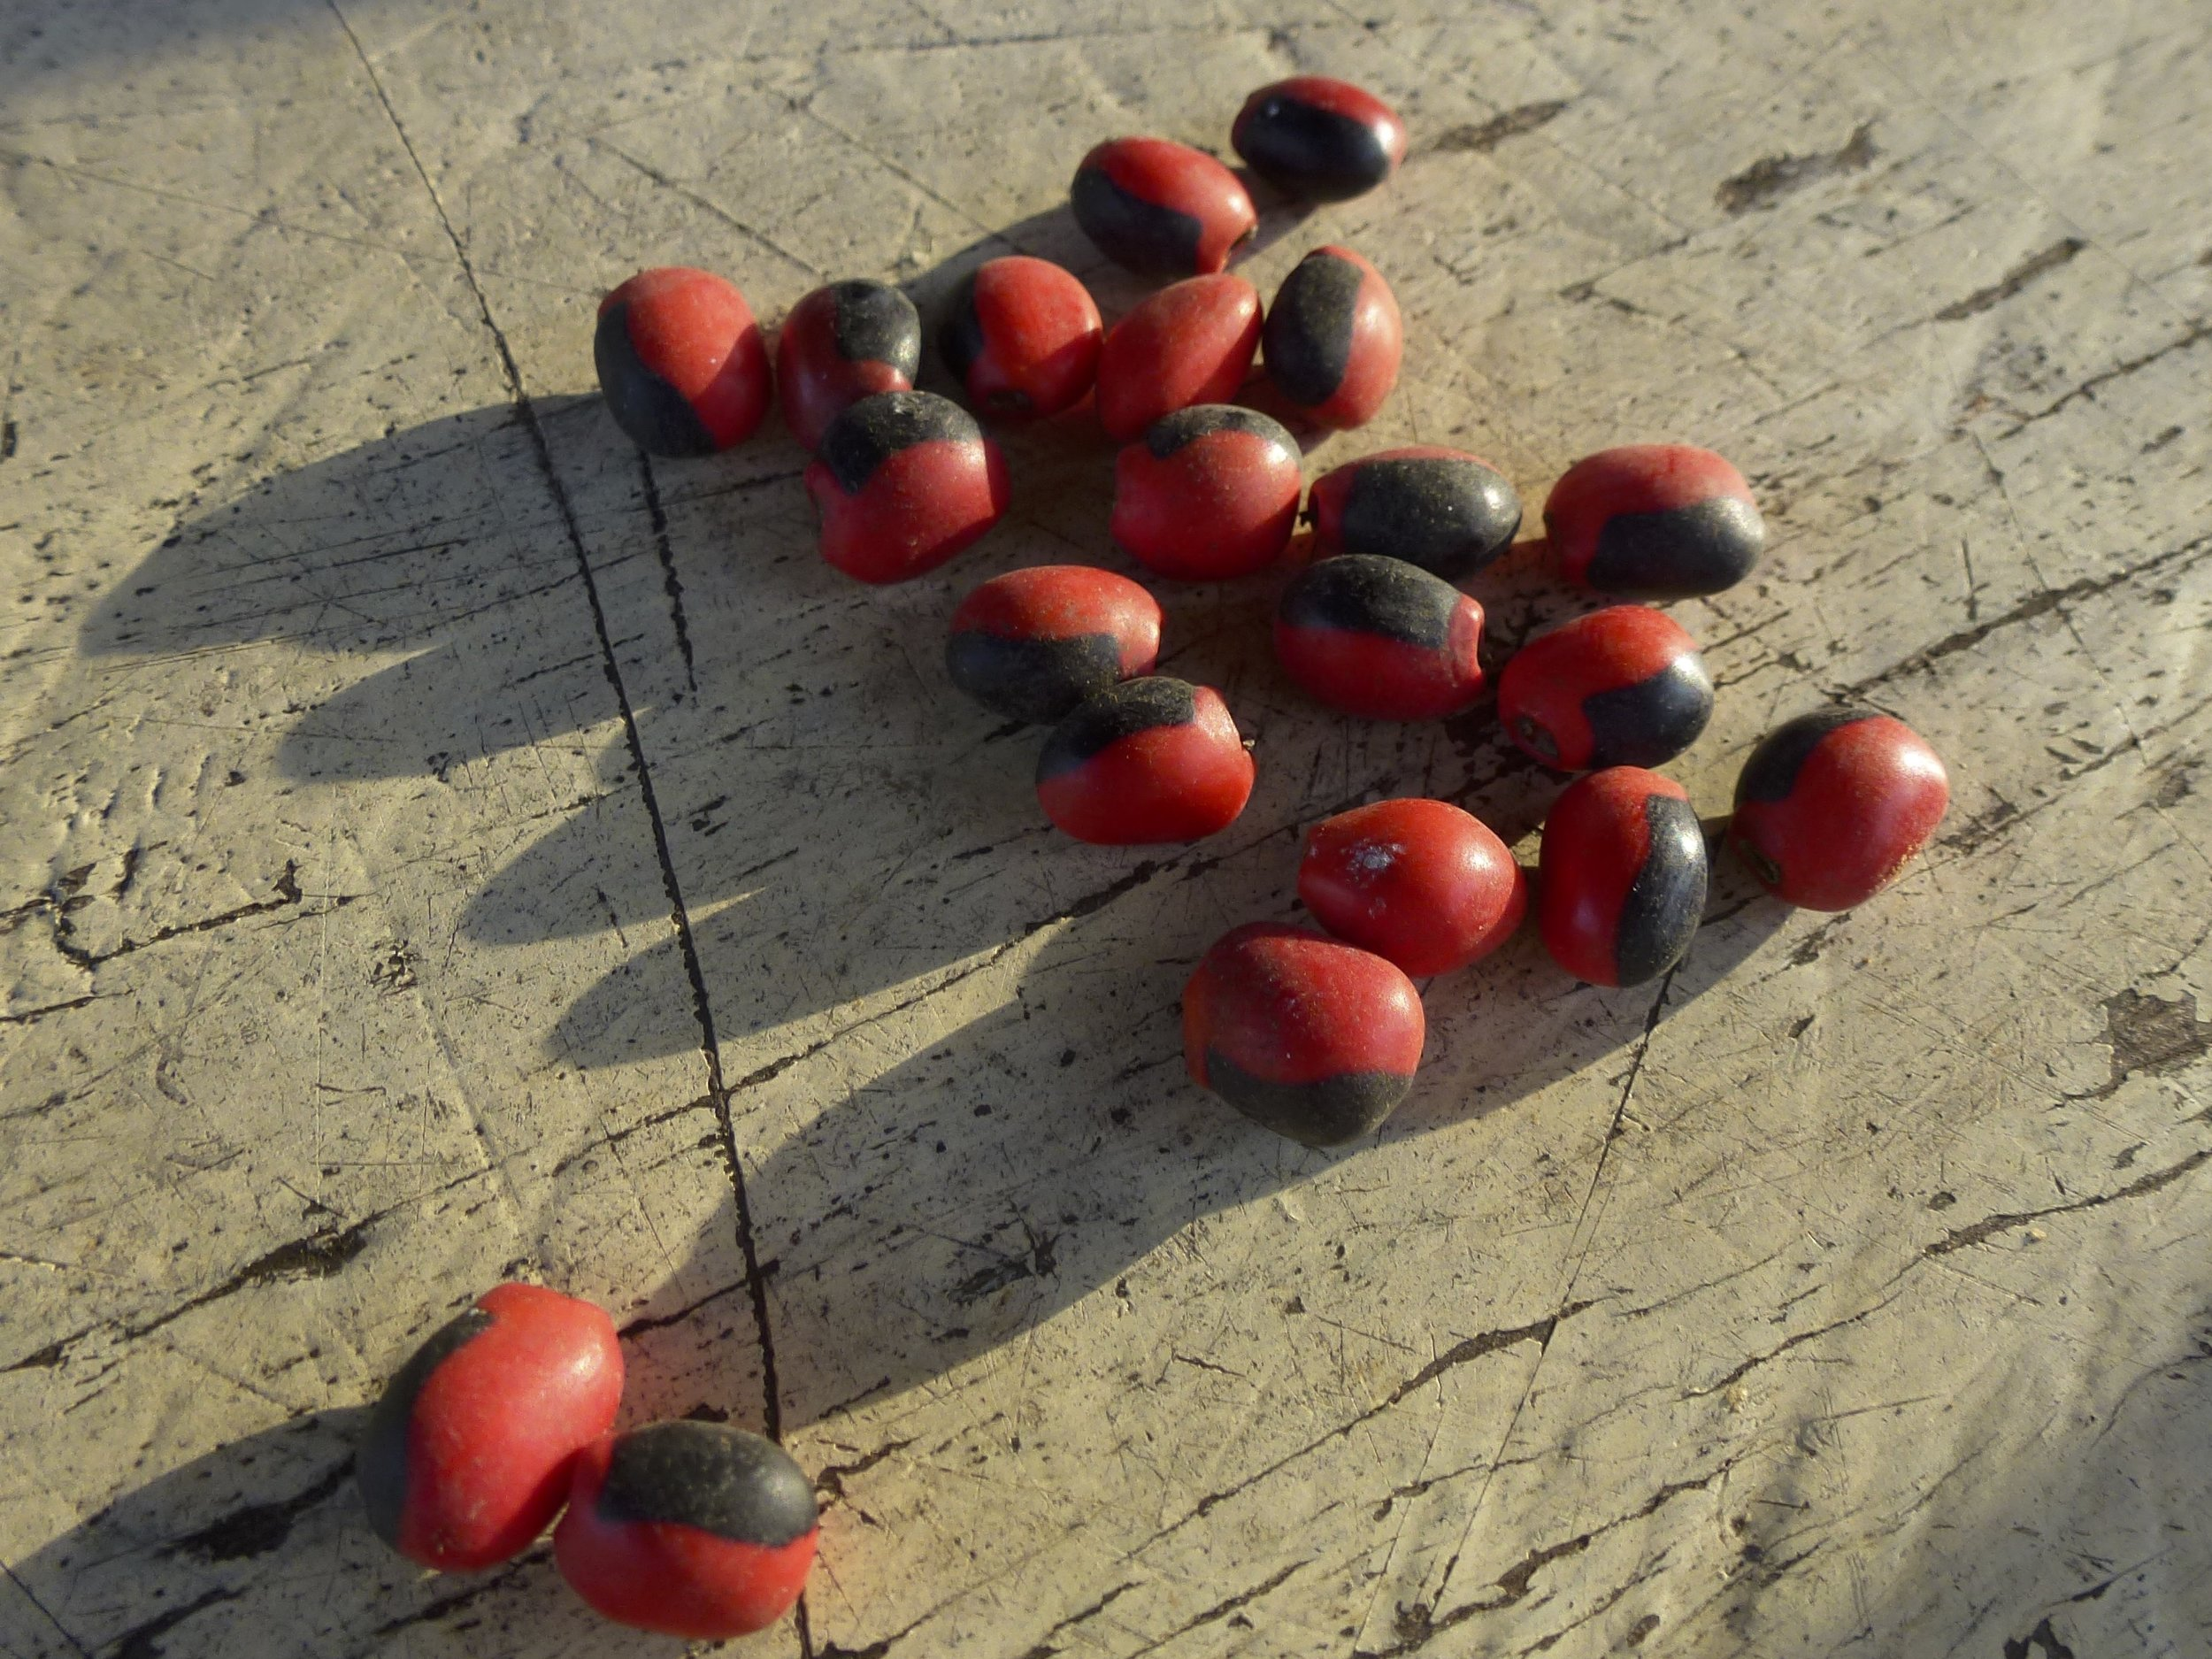 Huayruro beads ( Ormosia coccinea ), used to make jewellery by indigenous groups across Amazonia | Lewis Daly / Guyana / 2012